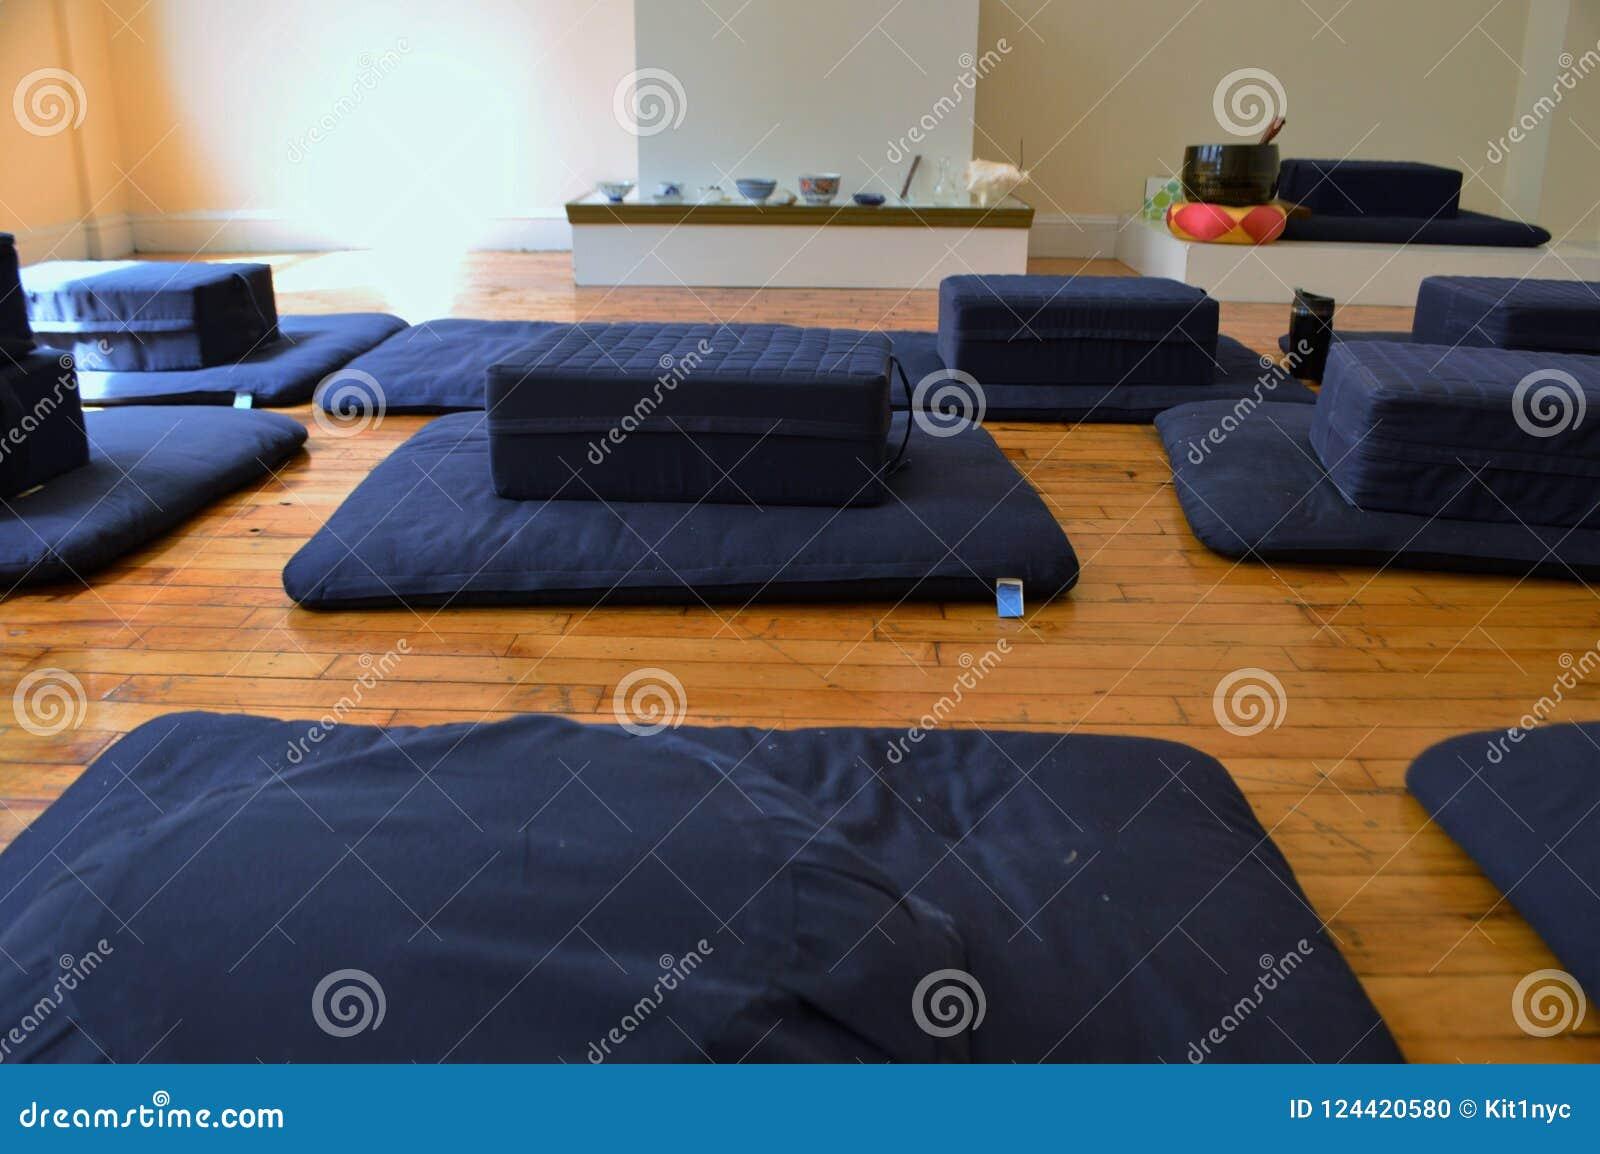 Meditation Room Set Up Cushions And Pillows Preparation Of